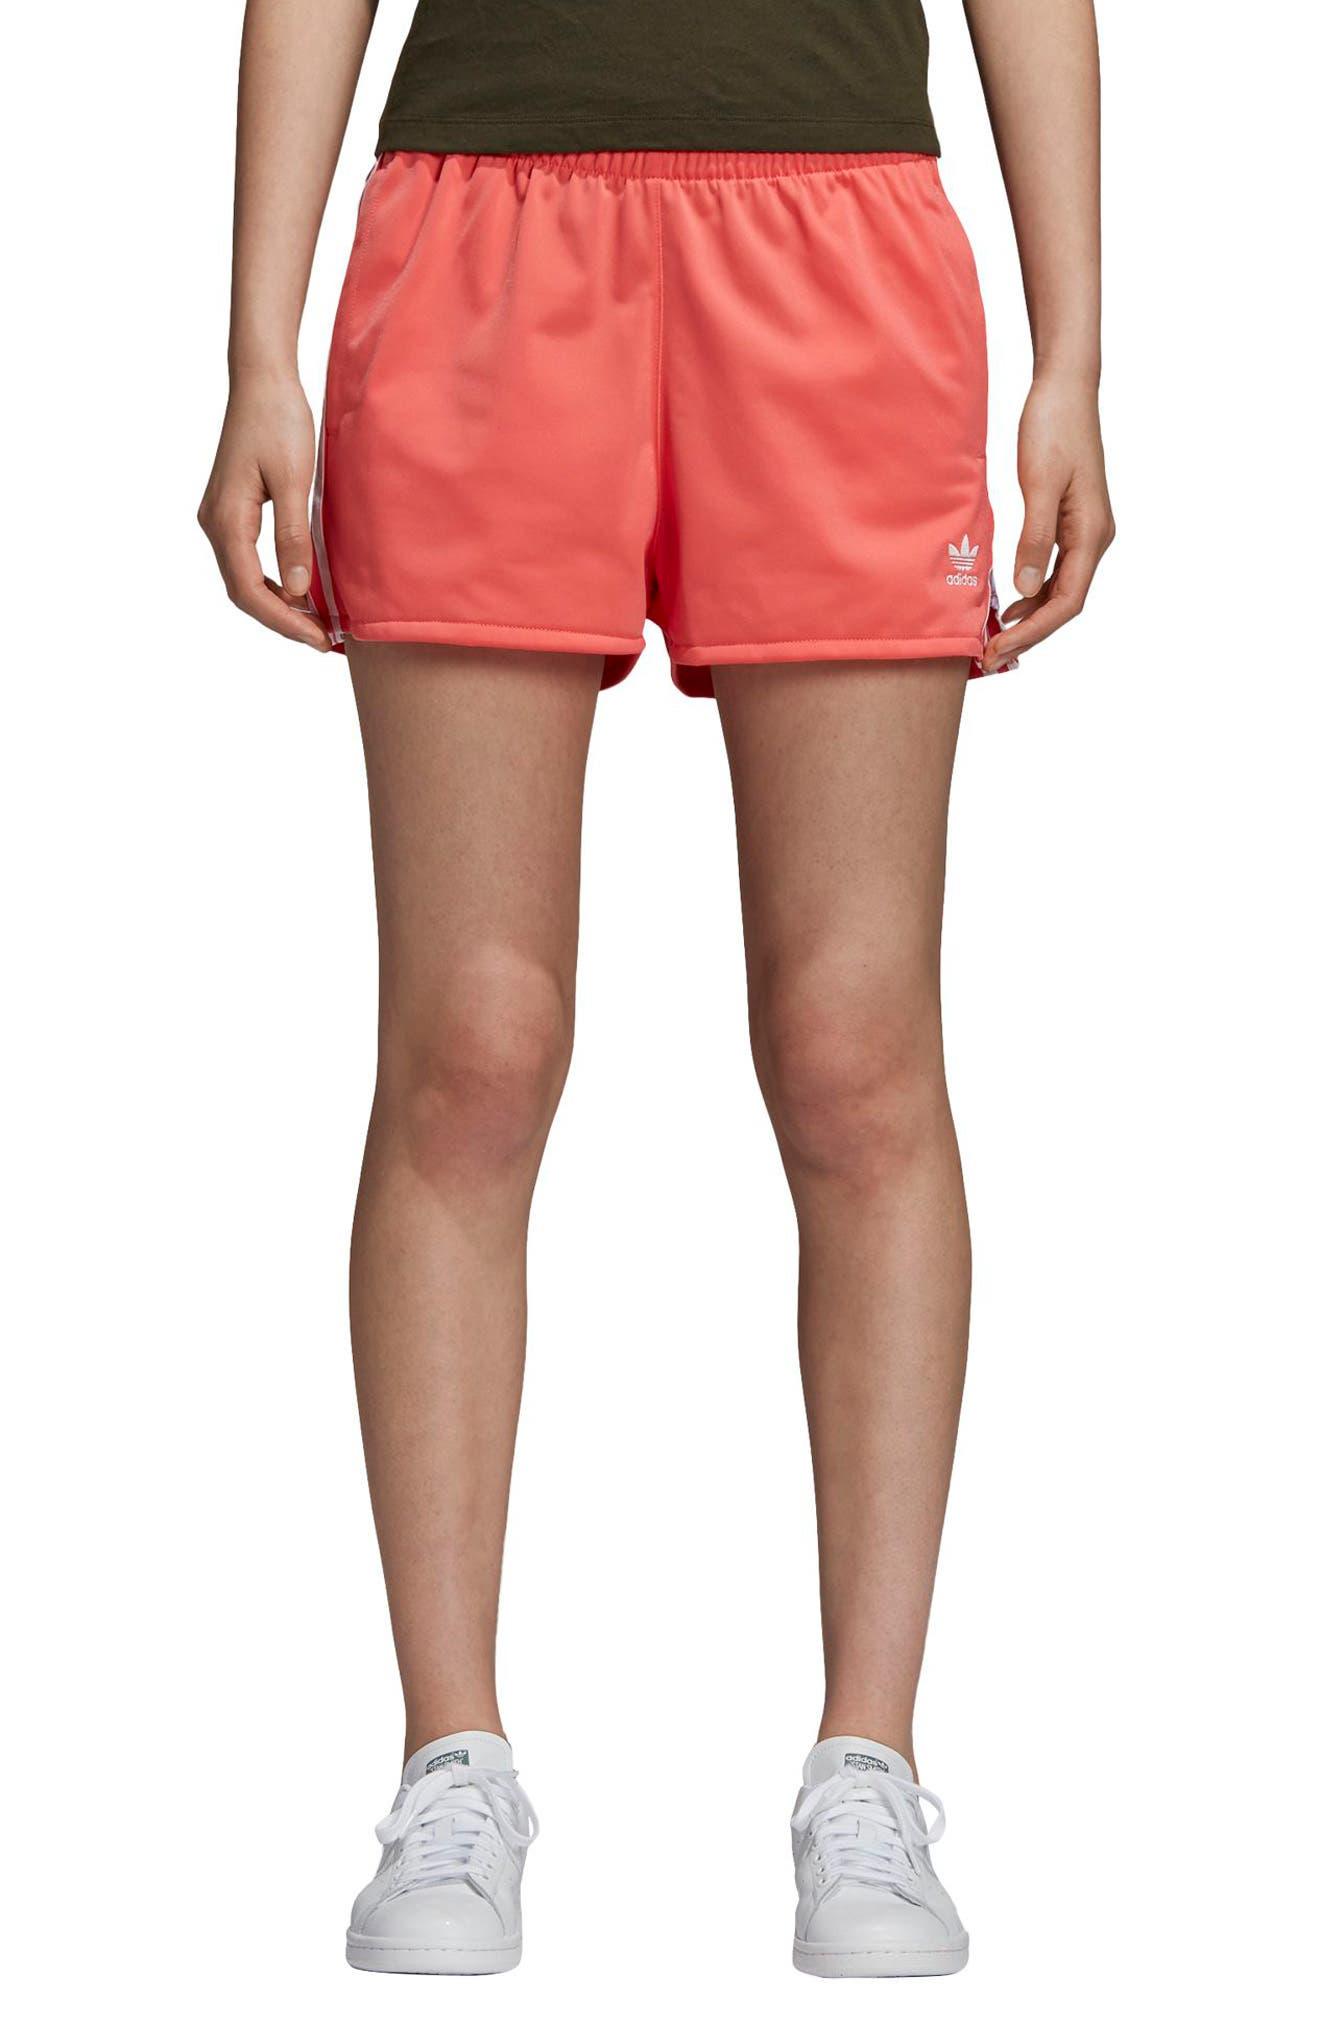 ADIDAS ORIGINALS 3-Stripes Shorts, Main, color, 600